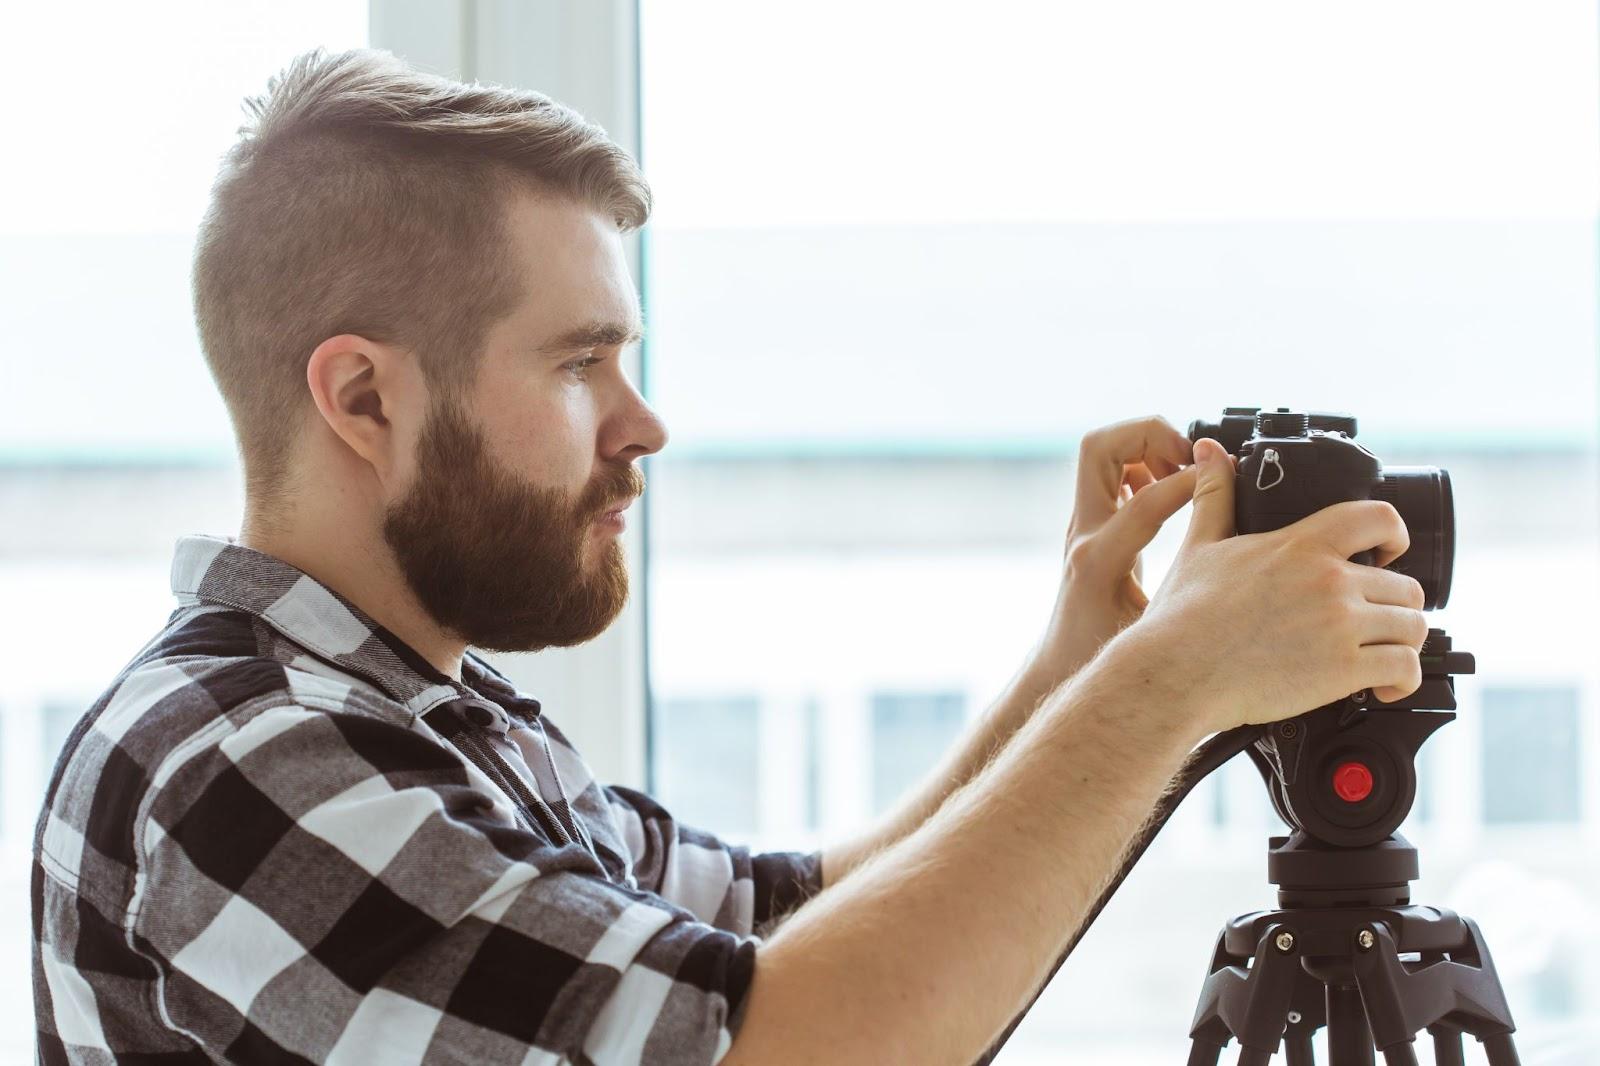 man setting up video recording equipment